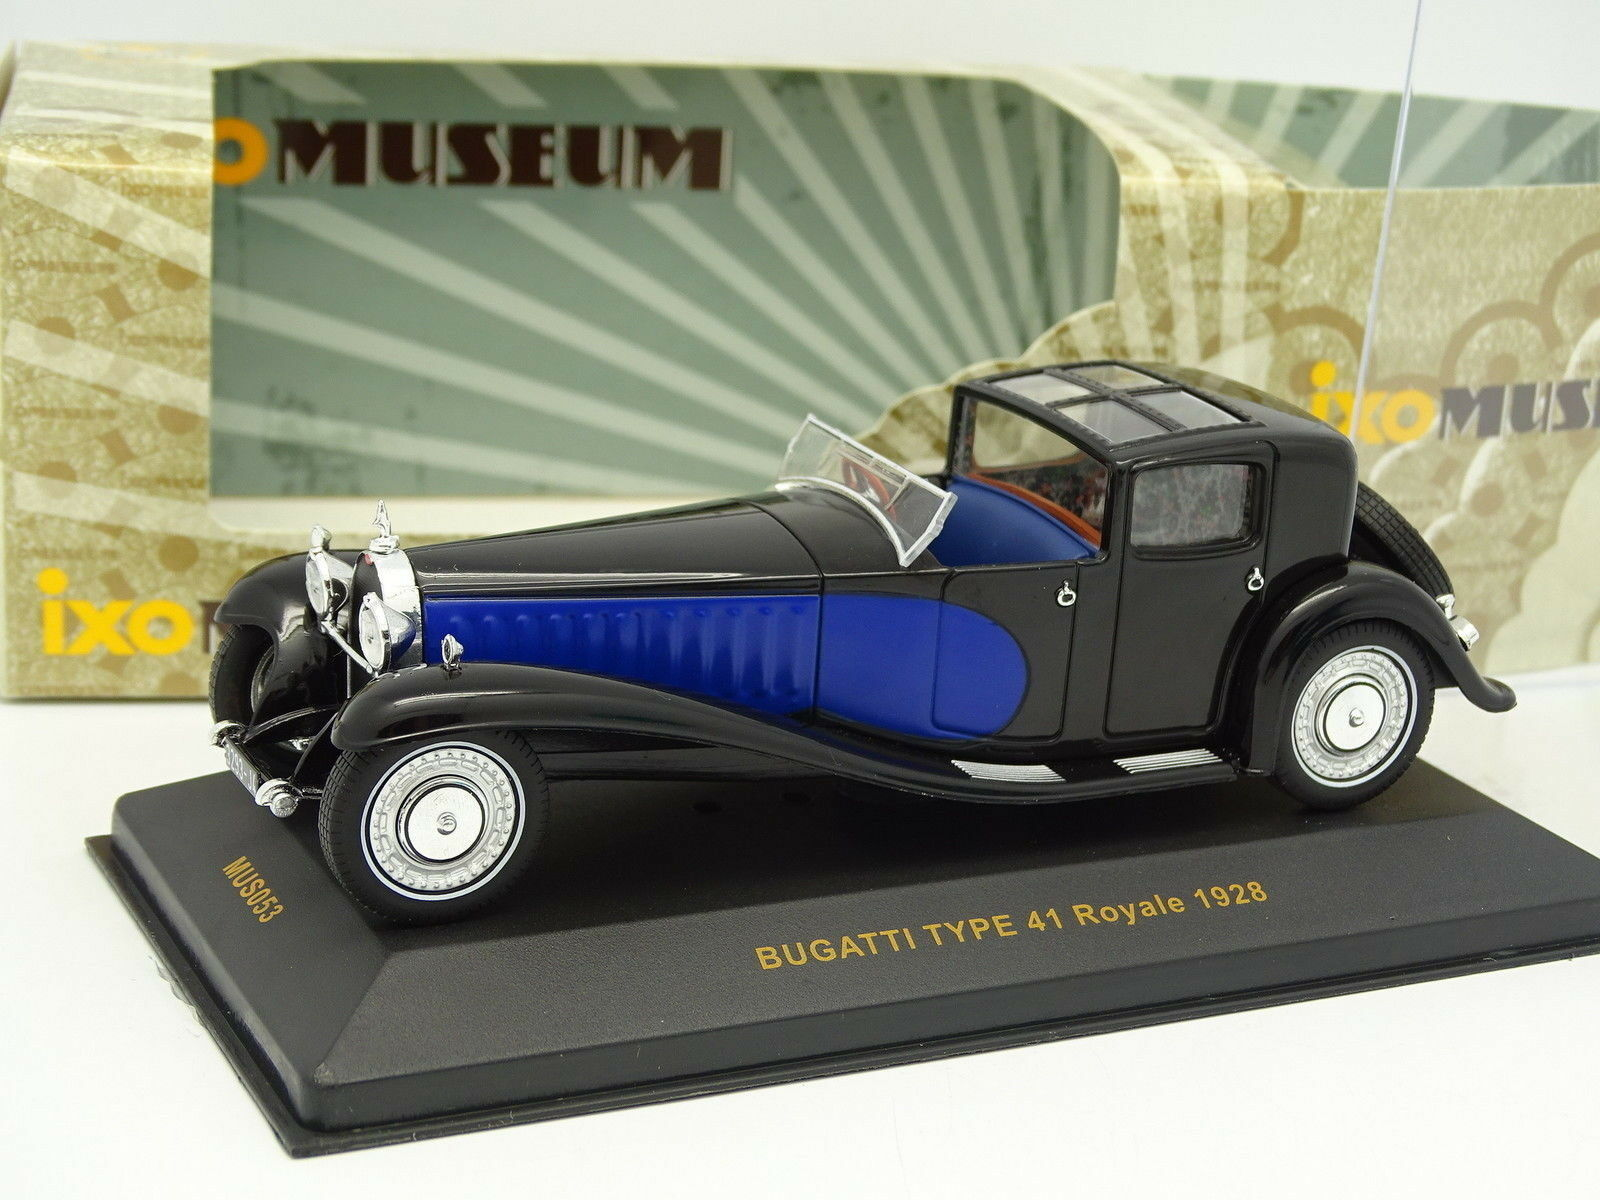 Ixo 1 43 - Bugatti Type 41 Royale 1928